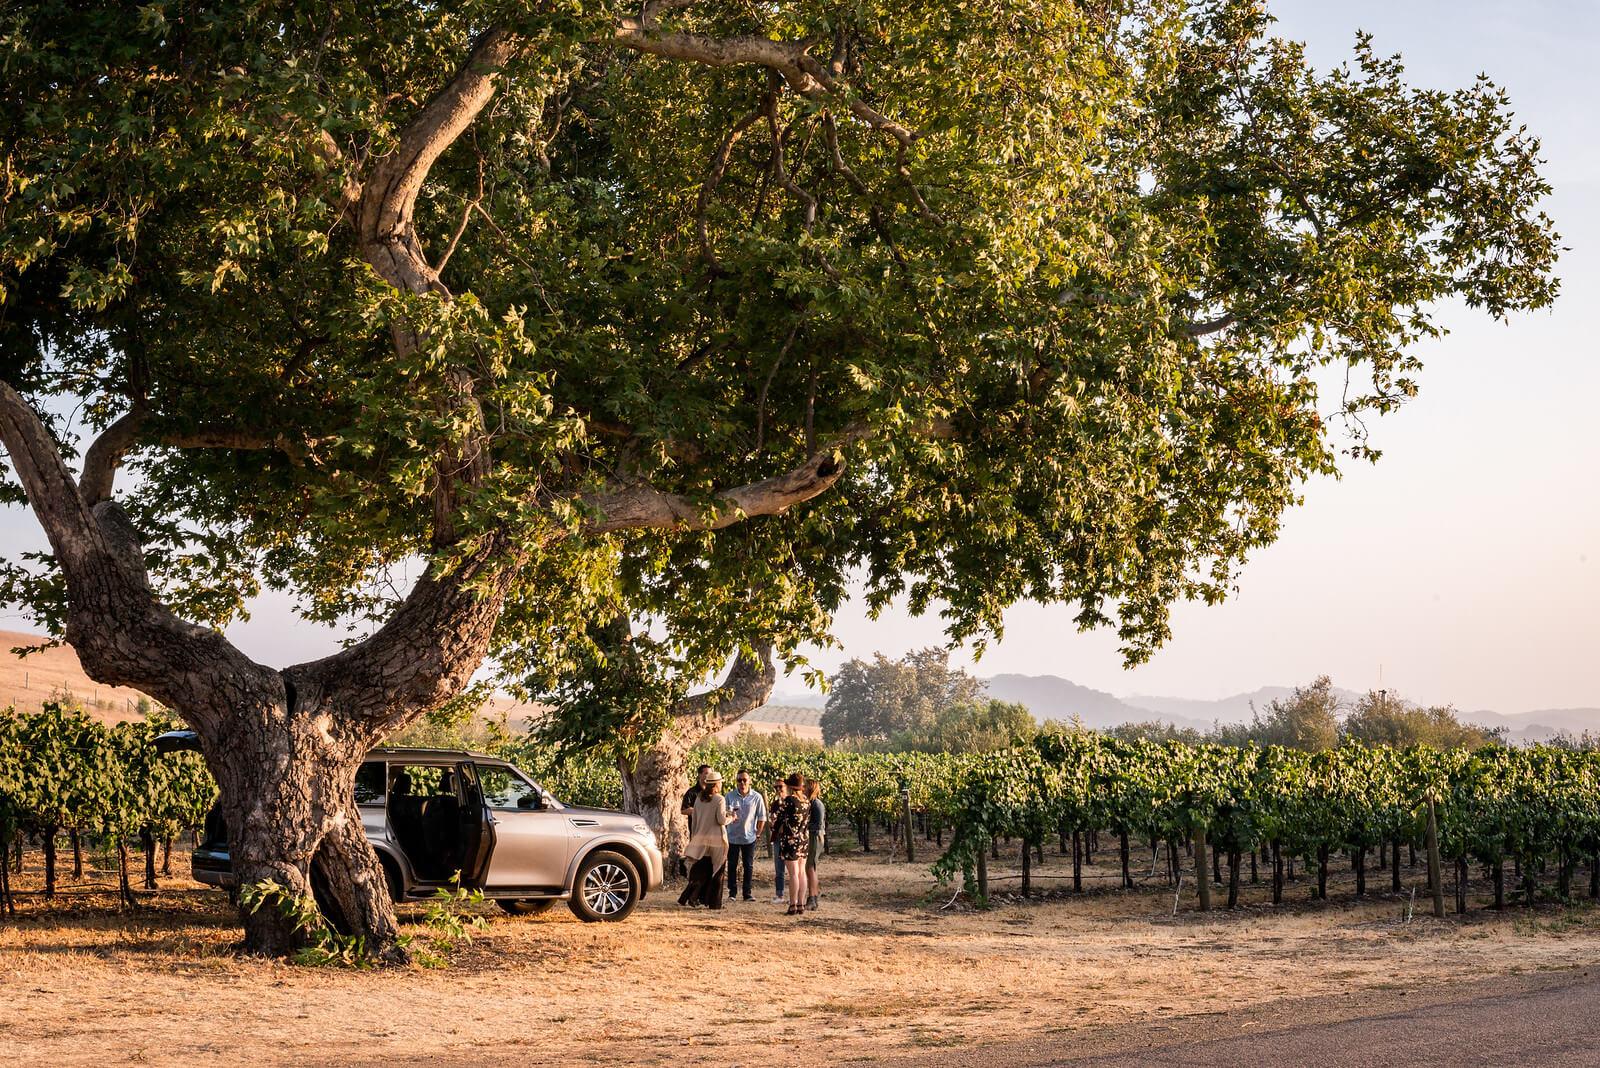 Vineyard Excursion Tolosa San Luis Obispo